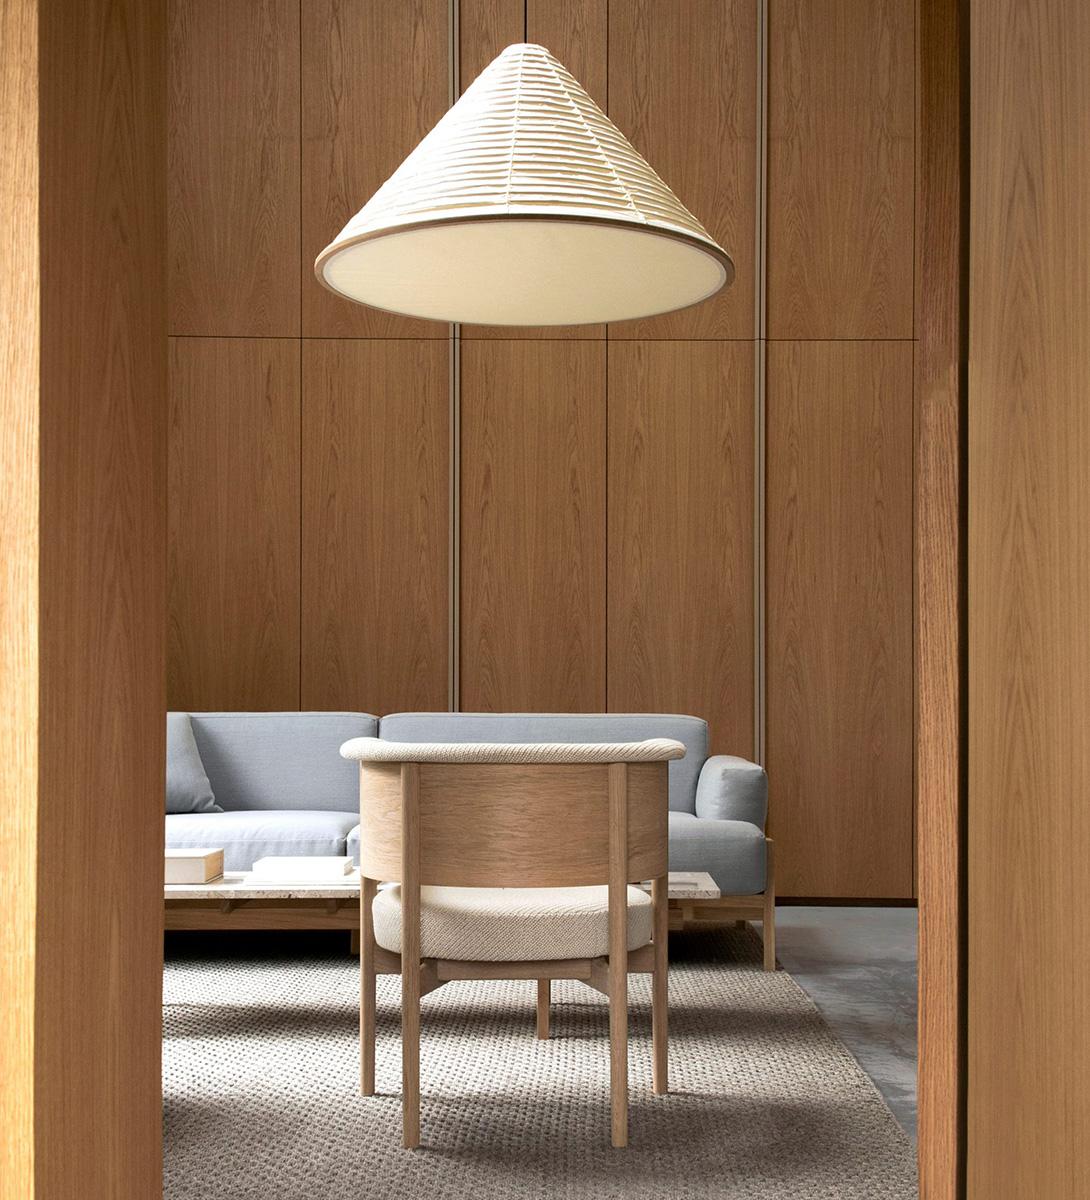 Archipelago-House-Norm-Architects-Jonas-Bjerre-Poulsen-04